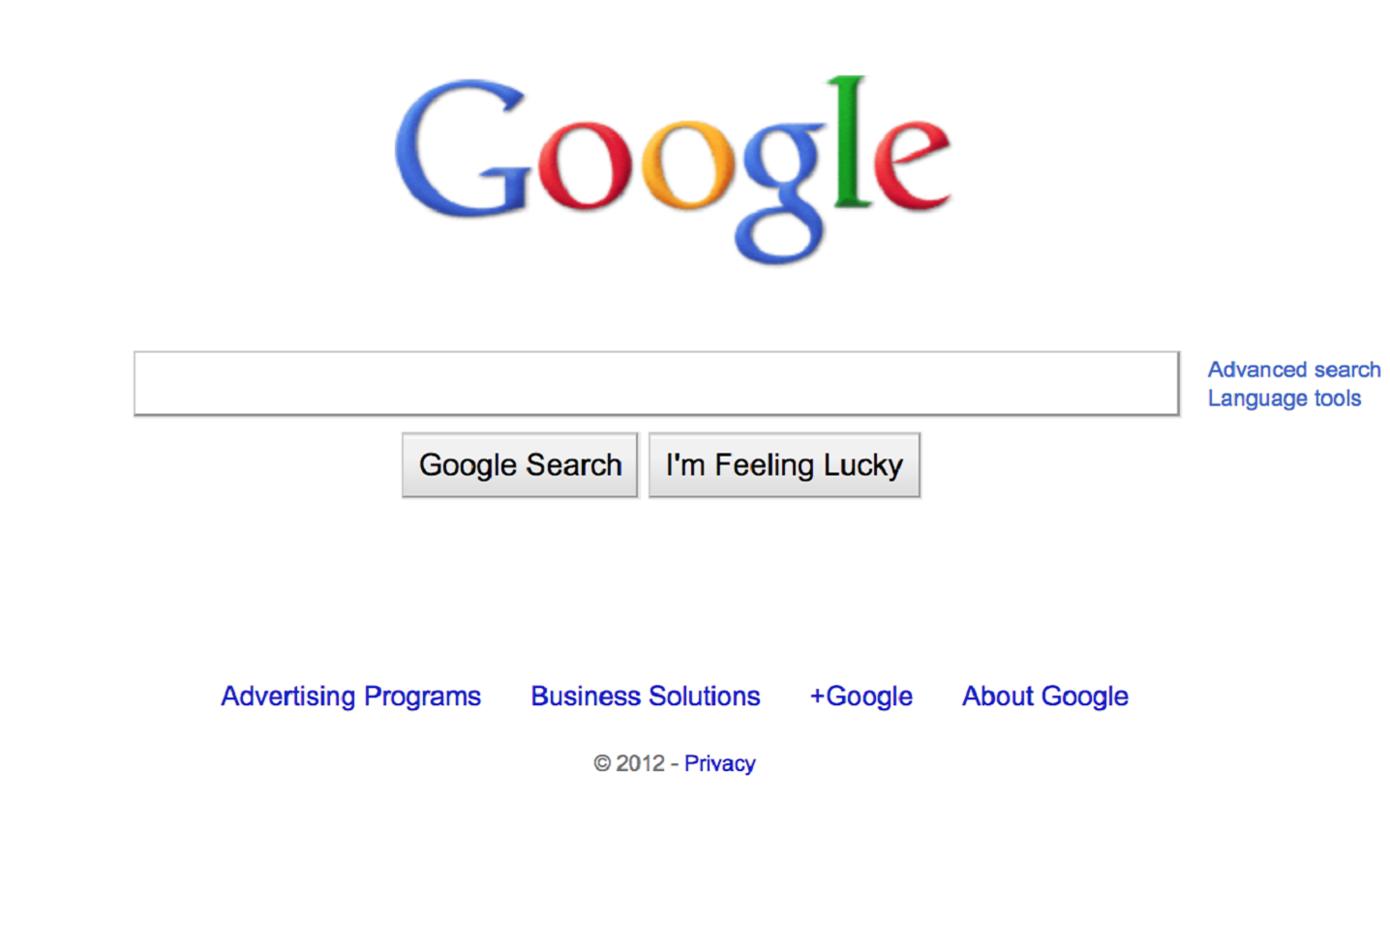 Google 2012